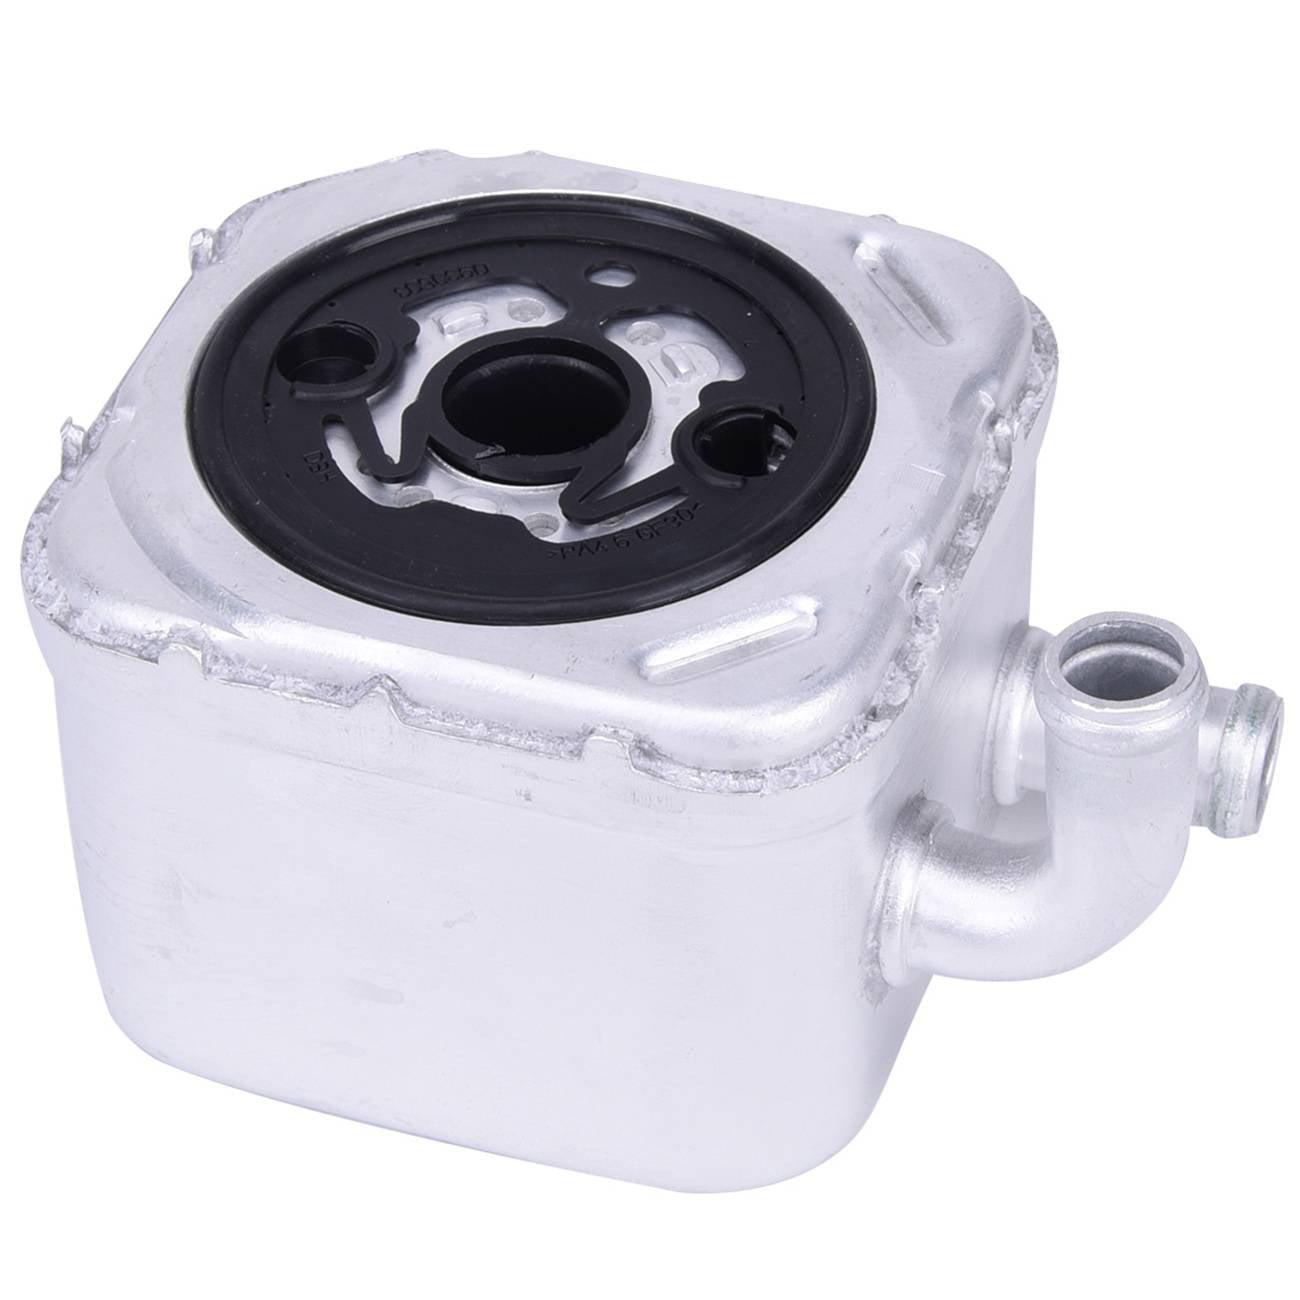 Bapmic 059117021B Engine Oil Cooler for Audi Volkswagen Skoda A4 A6 Passat